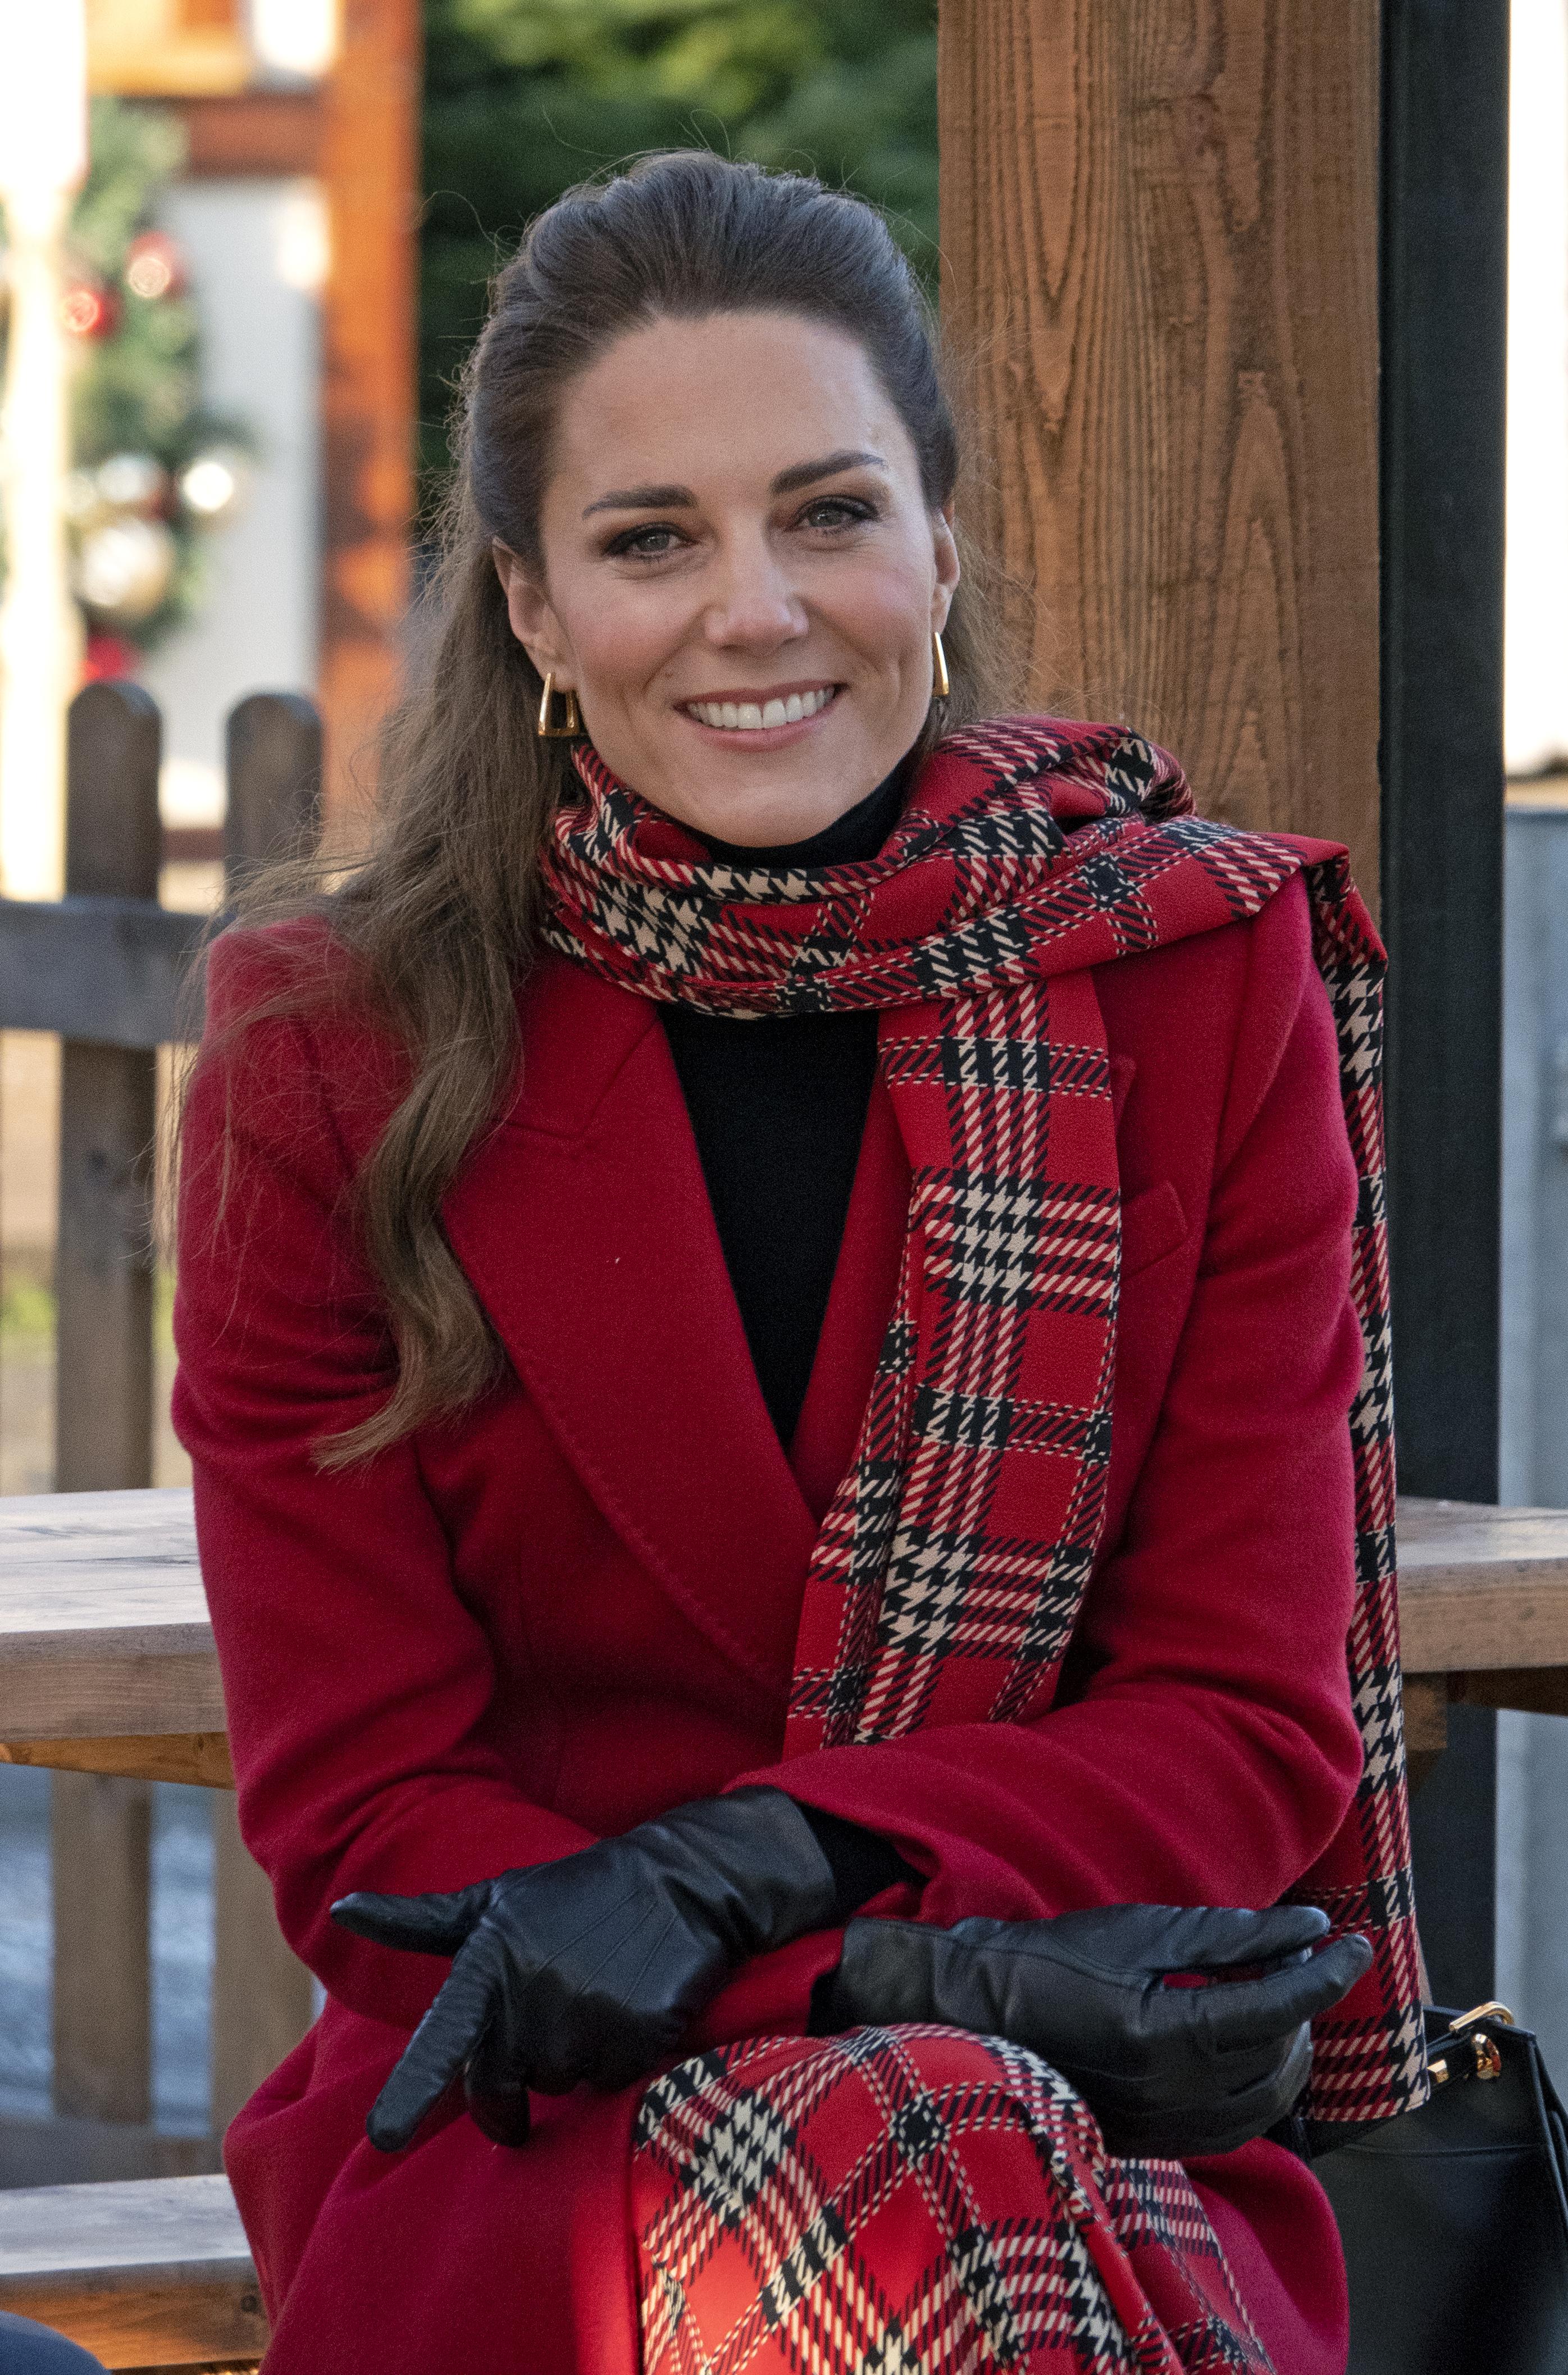 Photos of Prince William and Kate Middleton's Royal Train Tour